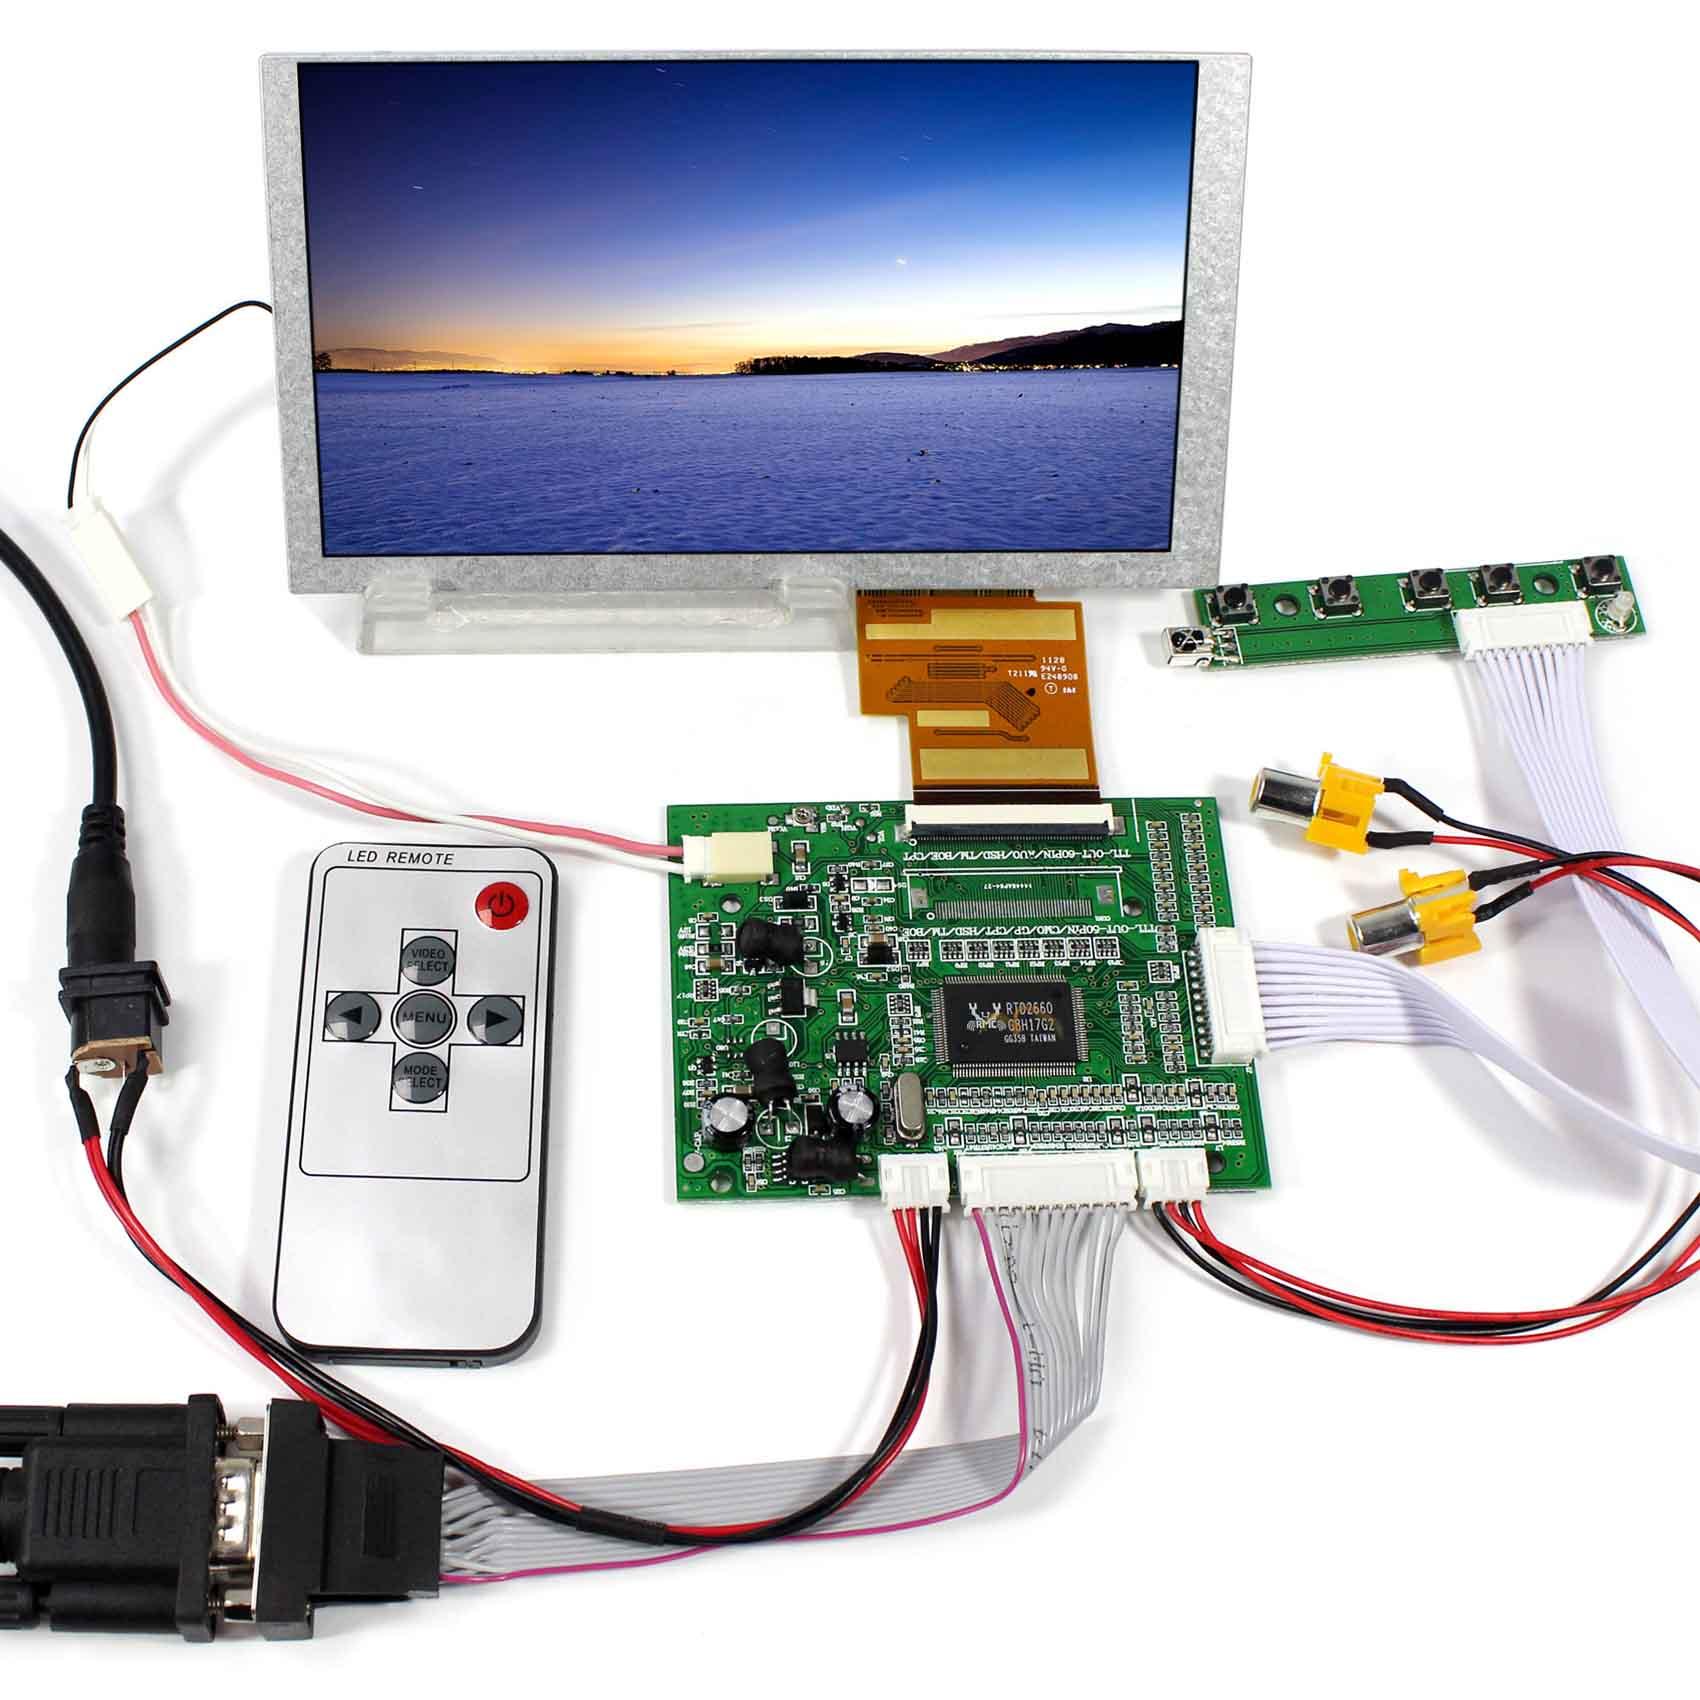 6.2inch HSD062IDW1 800x480 LCD Display+VGA 2AV Reversing LCD Driver Board VS-TY5060-V1 vga 2av audio reversing lcd driver board 10 1inch n101bge 1366 768 lcd panel